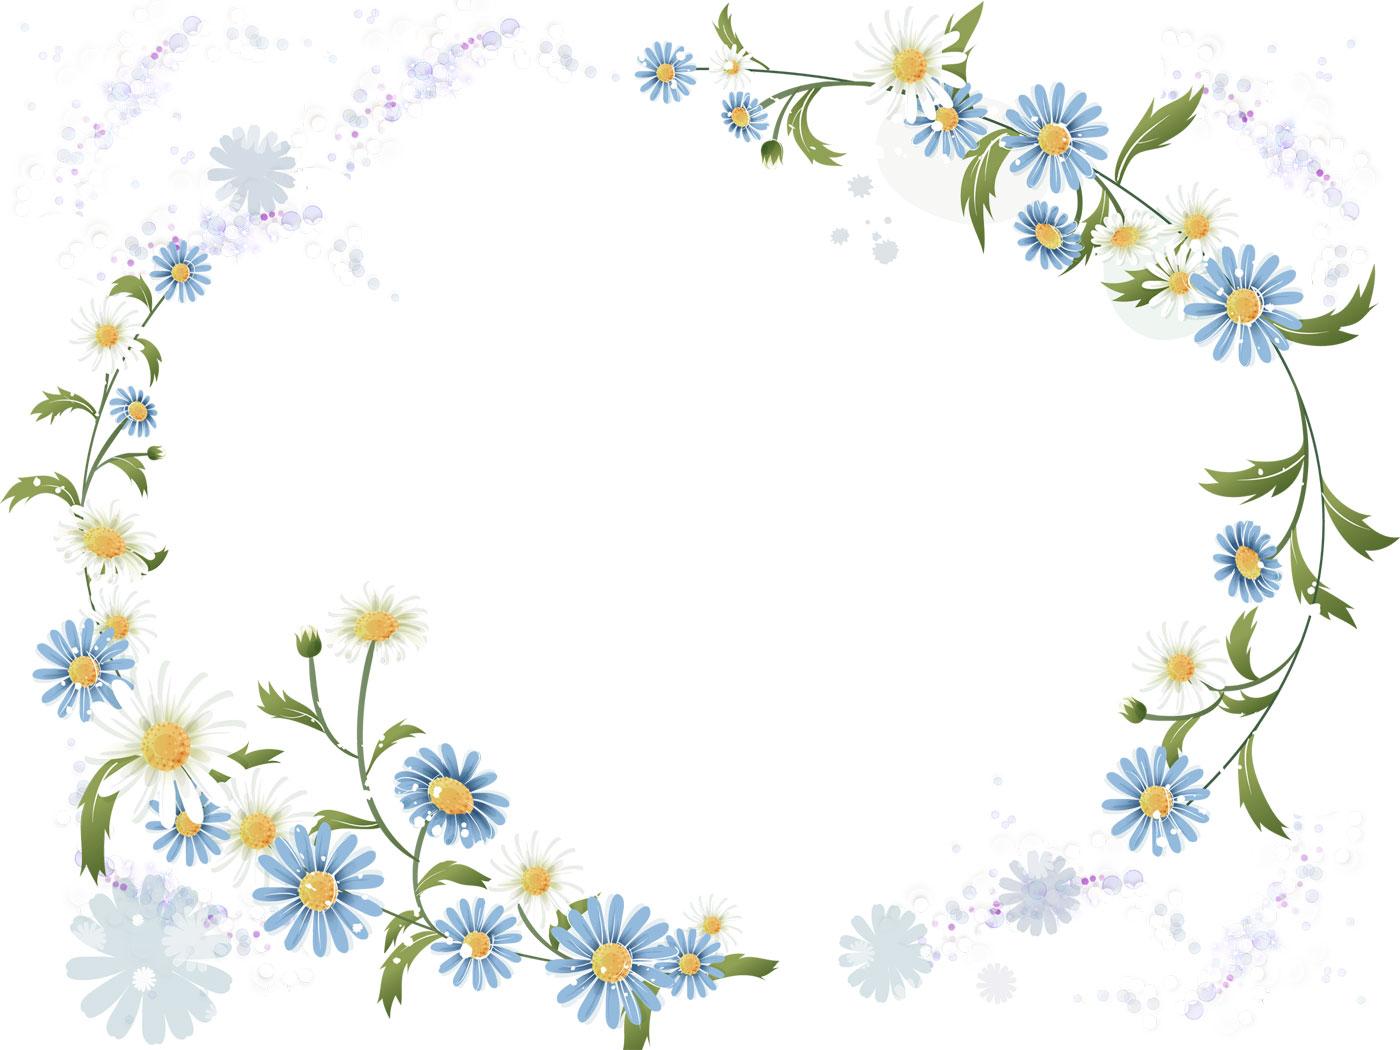 Картинки цветов пнг » DreemPics.com - лучшие ...: dreempics.com/flowers/2676-Kartinki_tsvetov_png.html